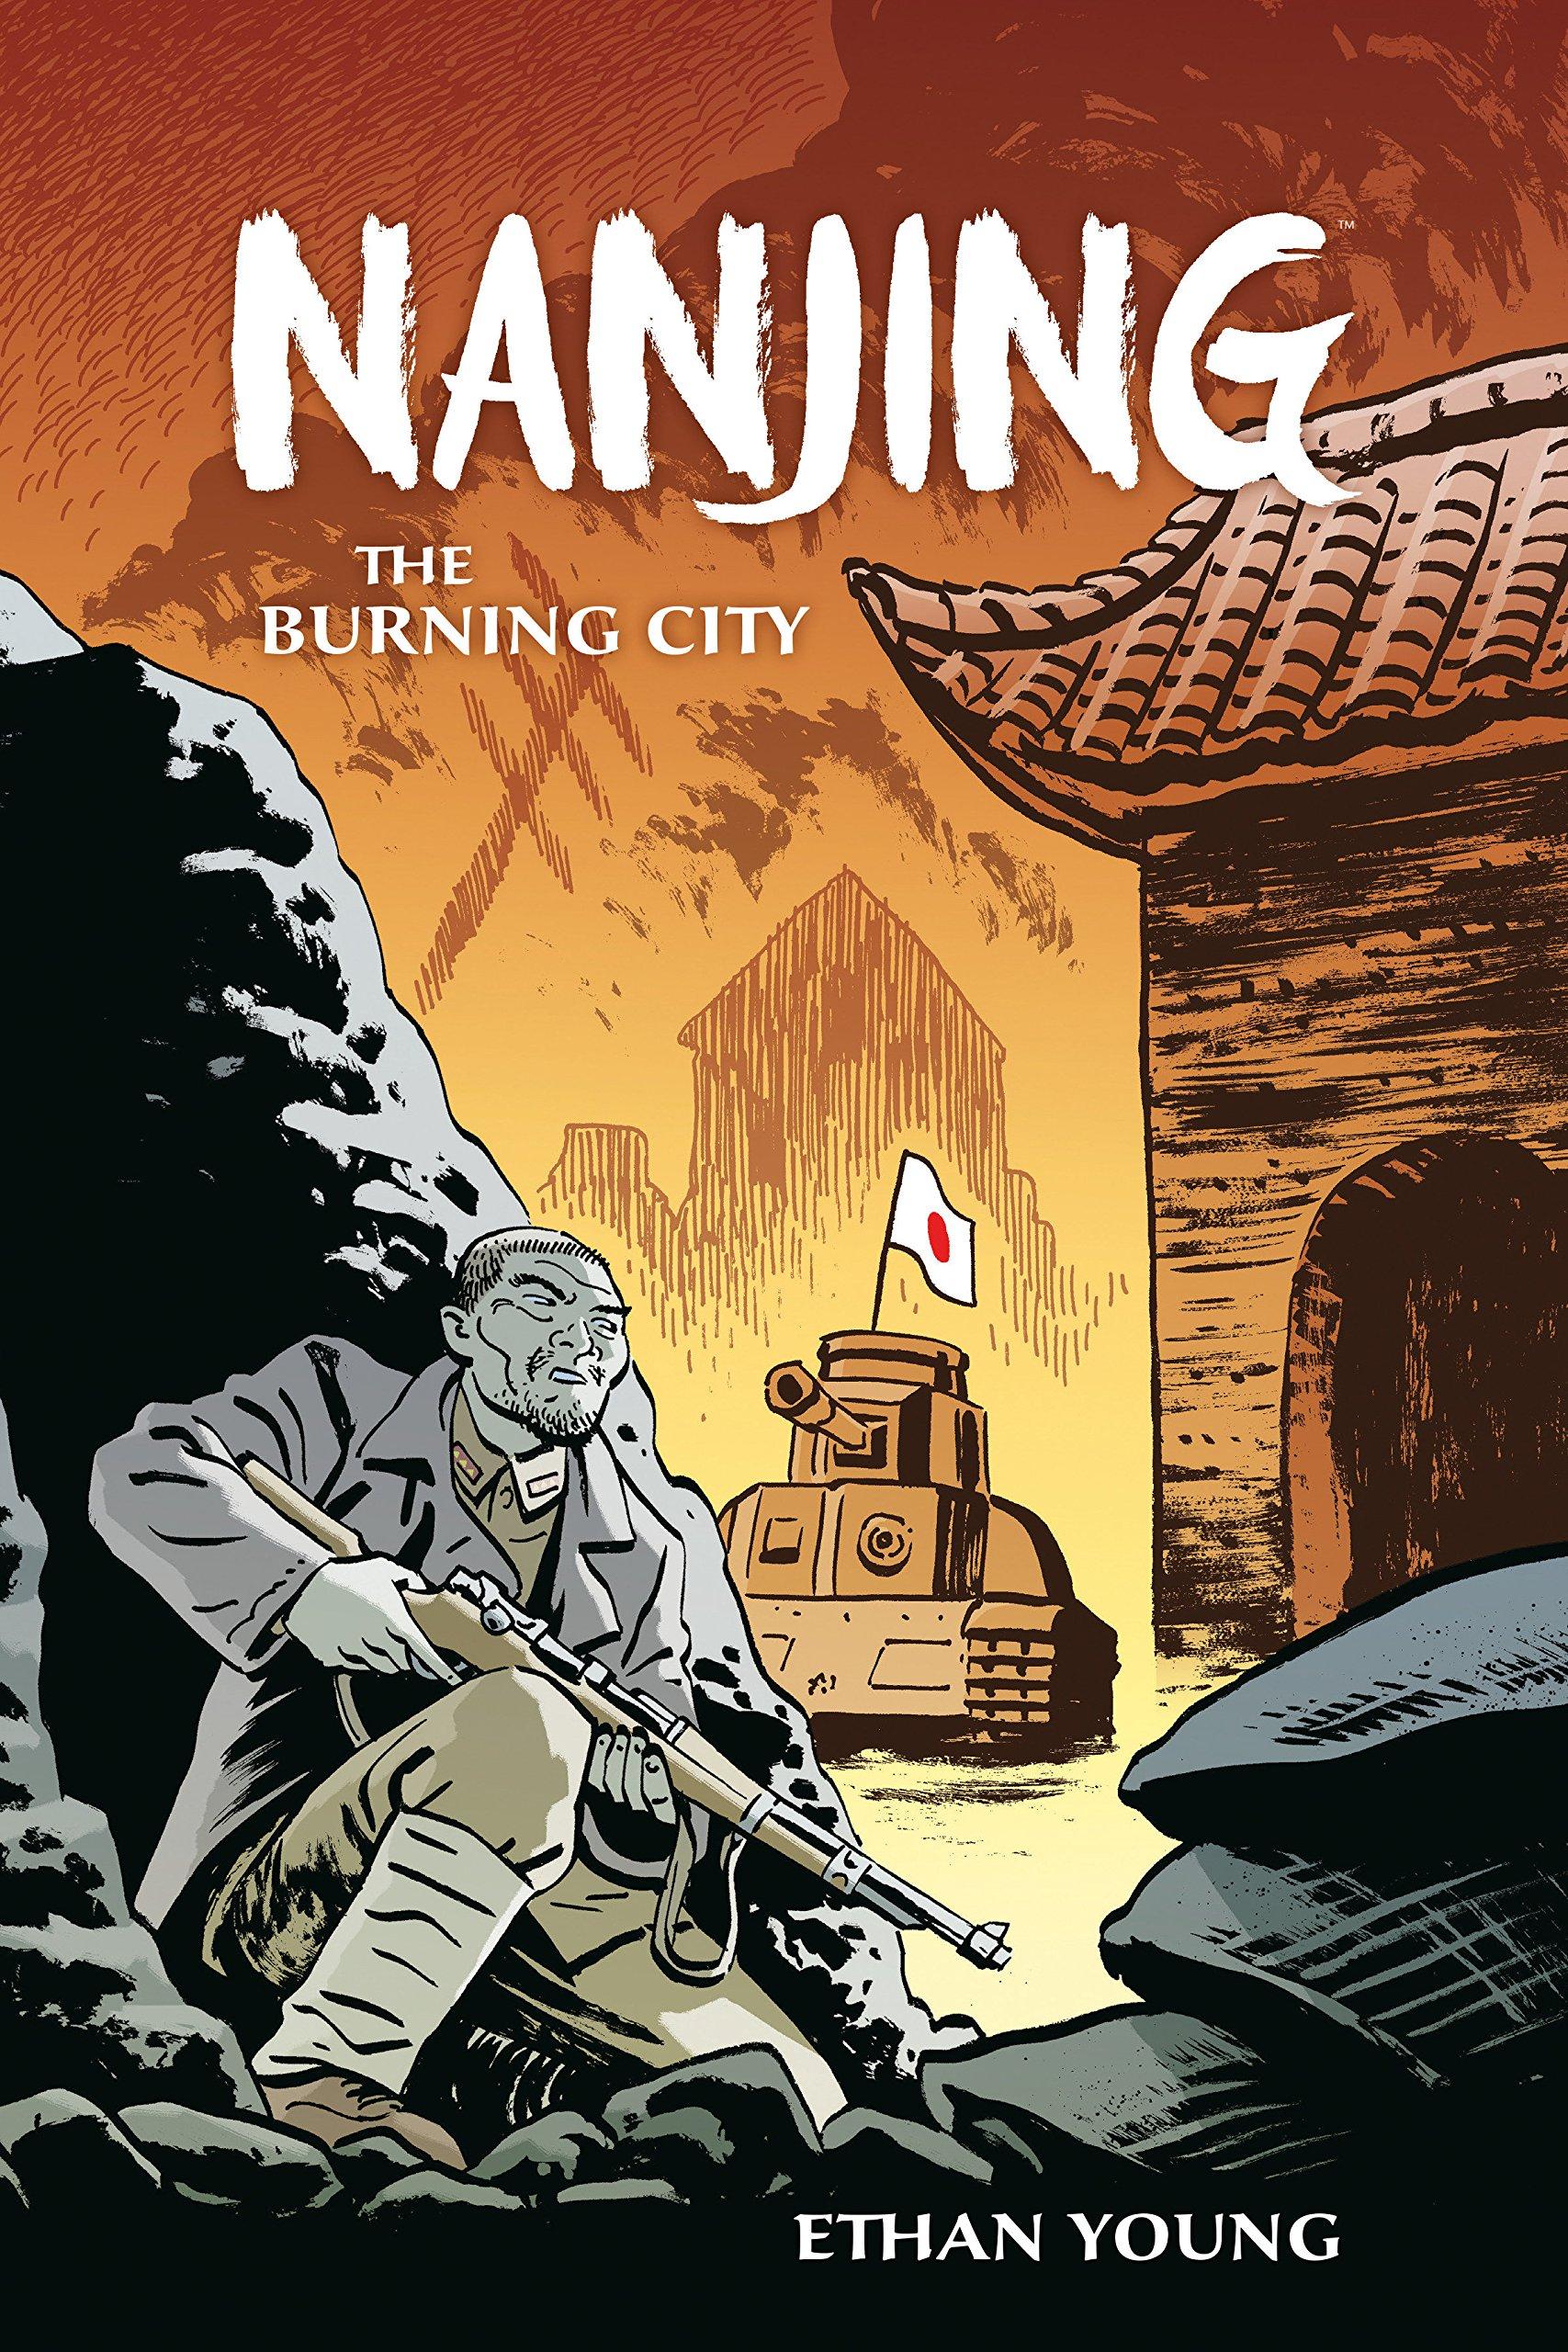 Nanjing: The Burning City